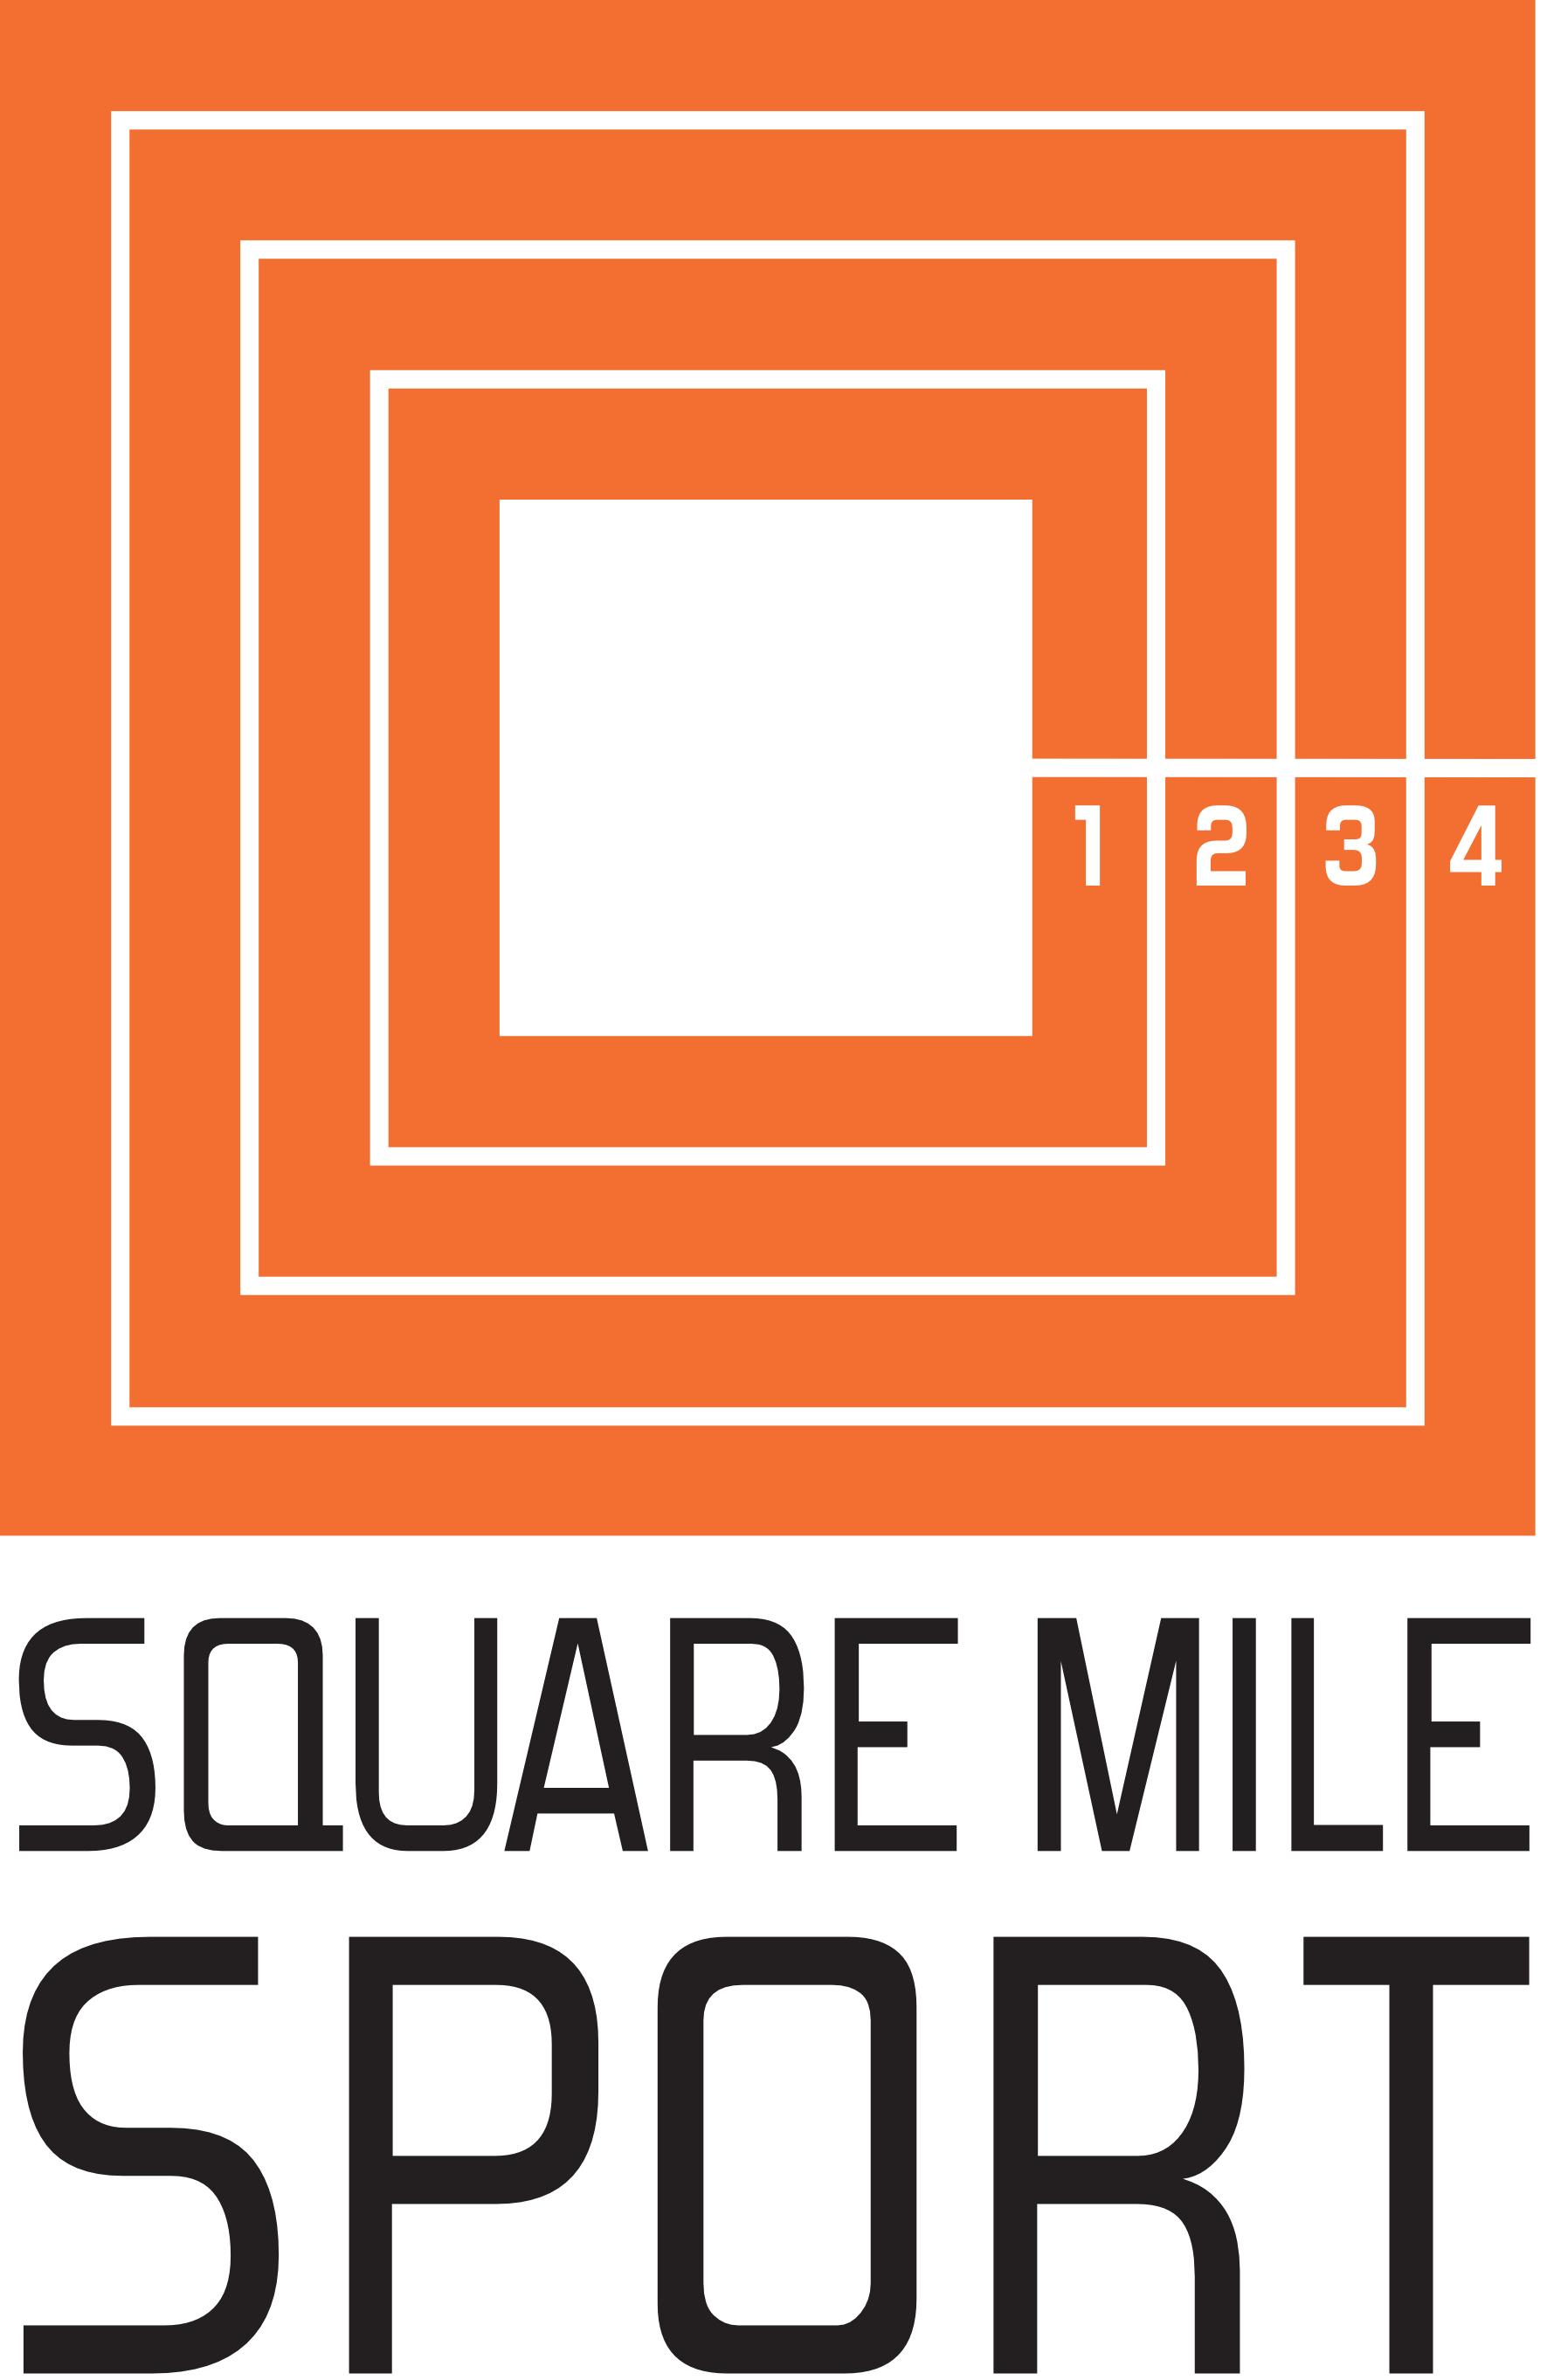 Square Mile Sport's logo